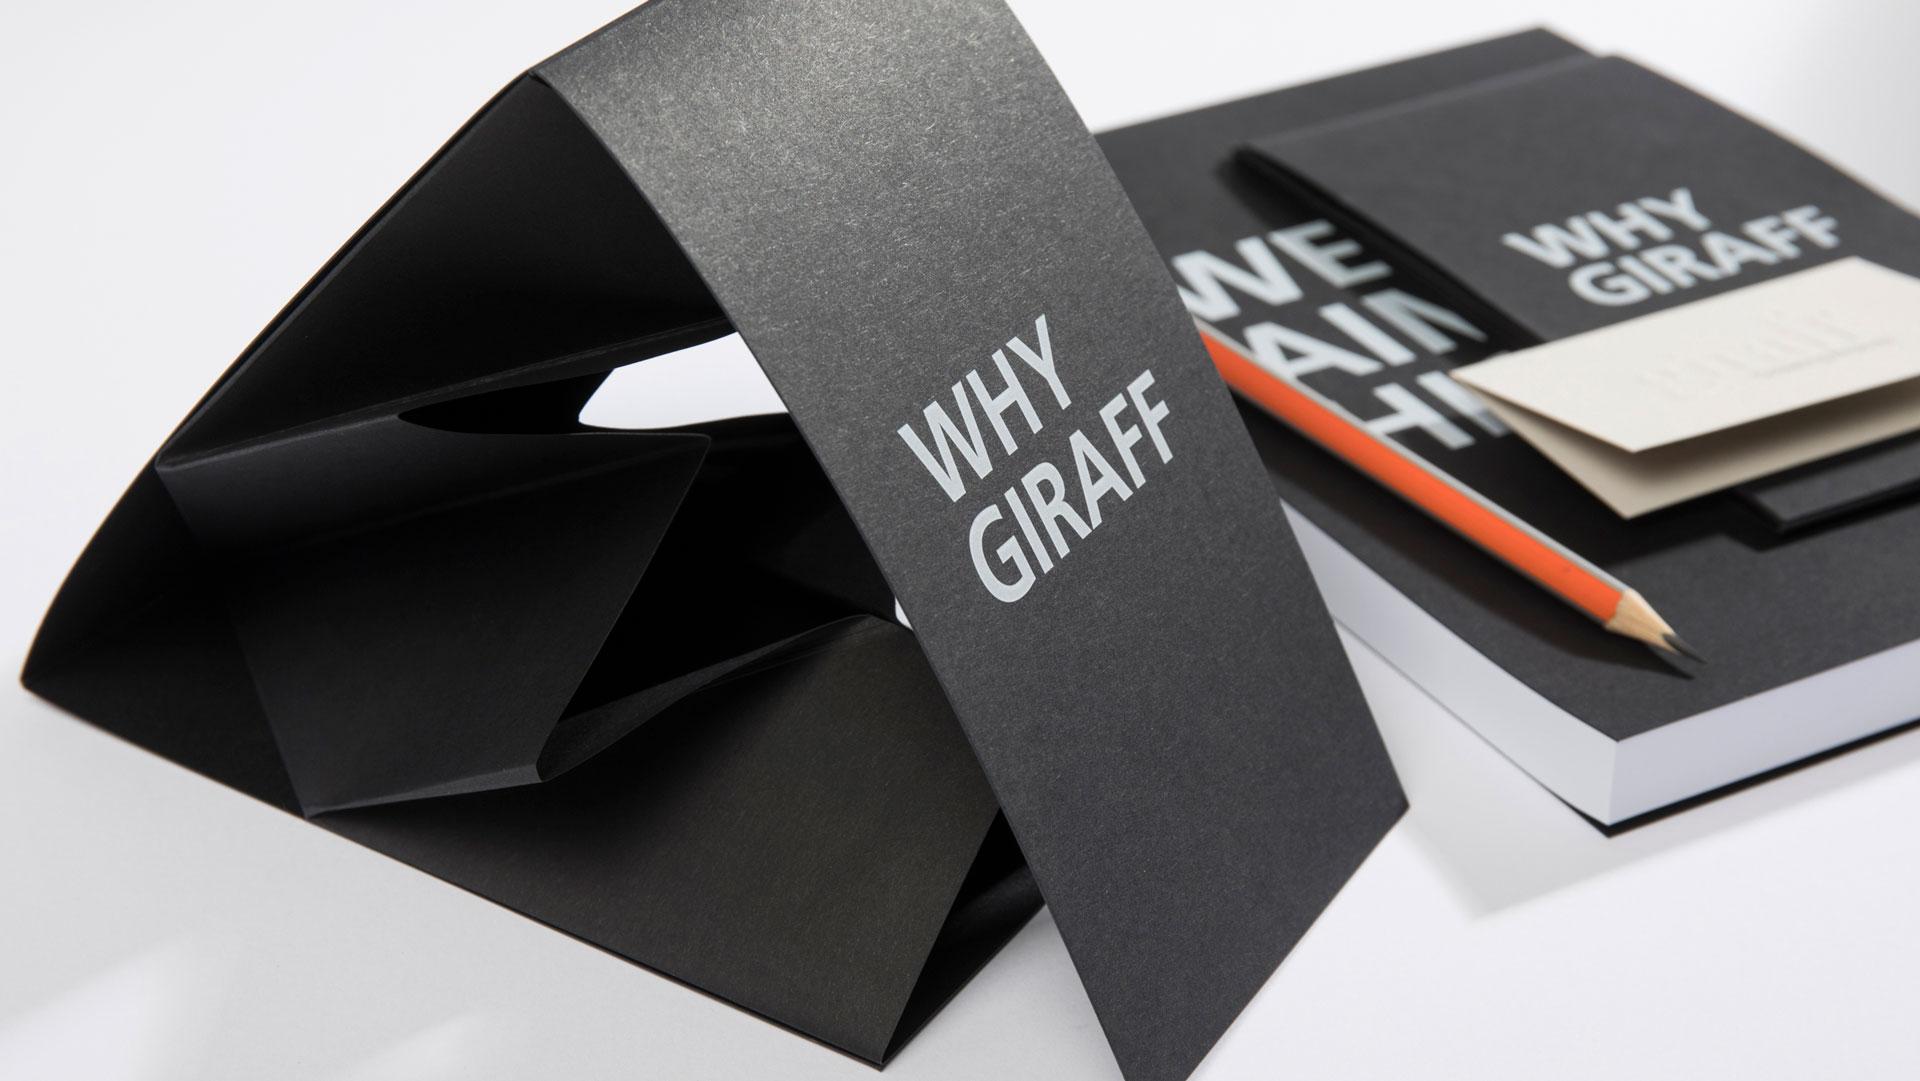 Giraff unfolding card